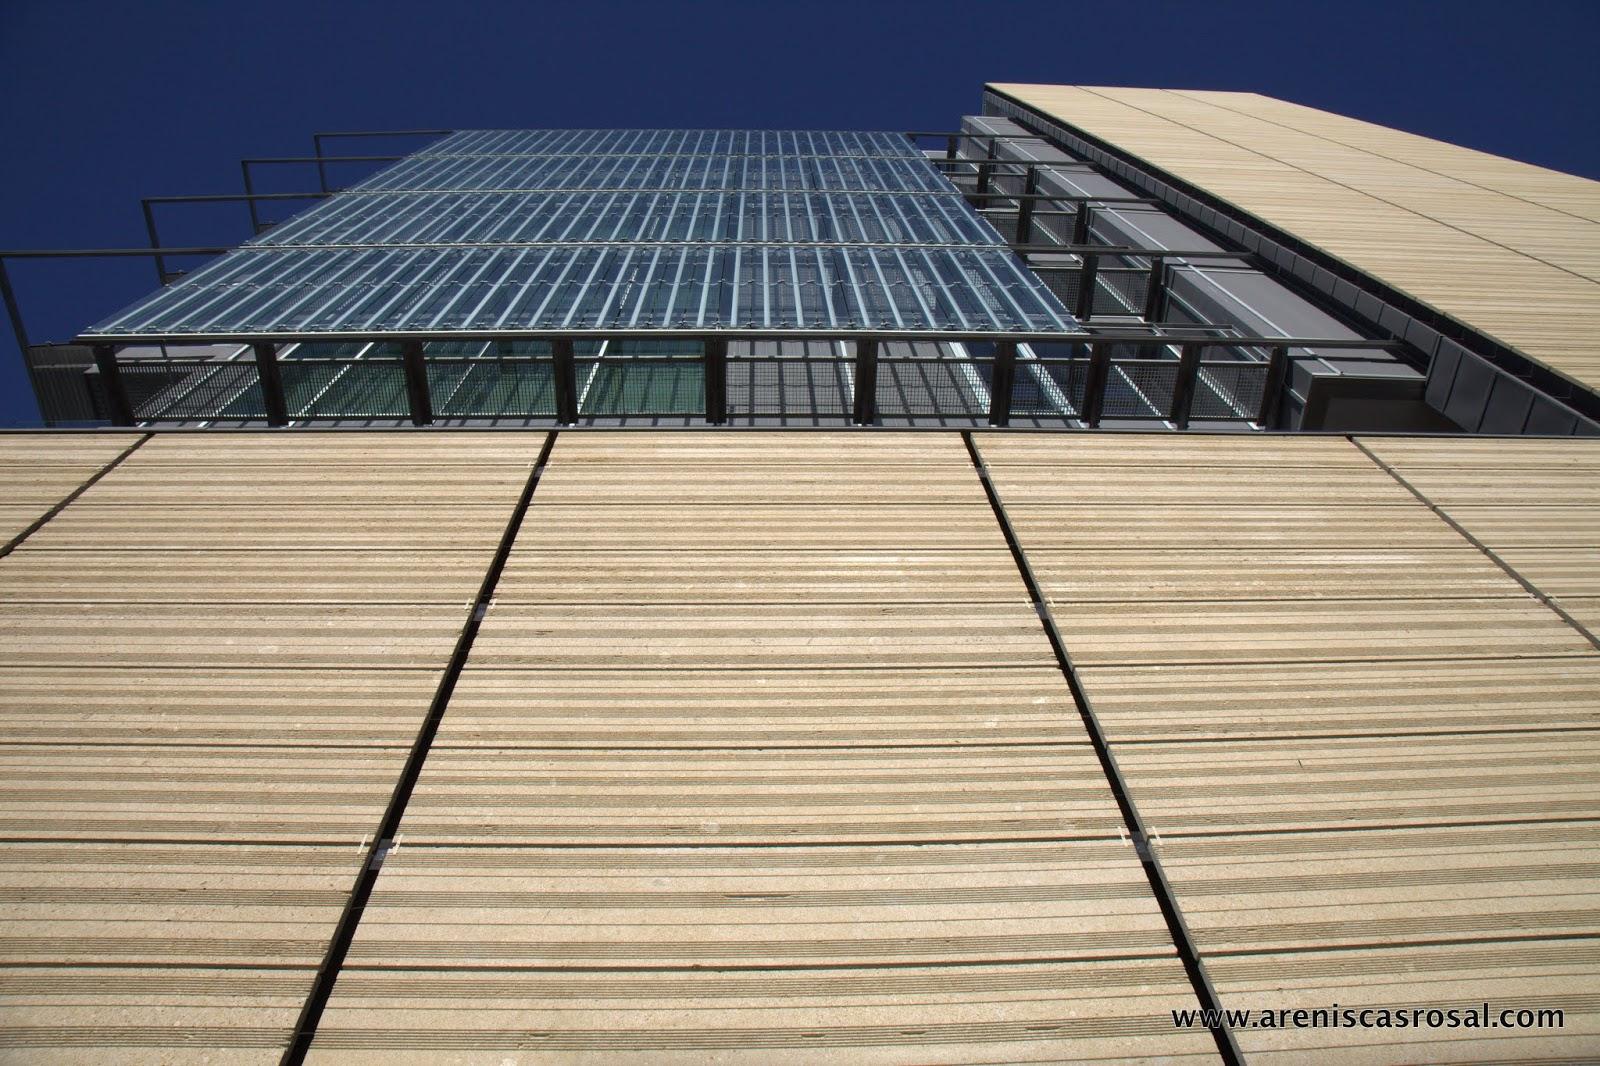 Suelo tecnico exterior images - Suelo tecnico exterior ...